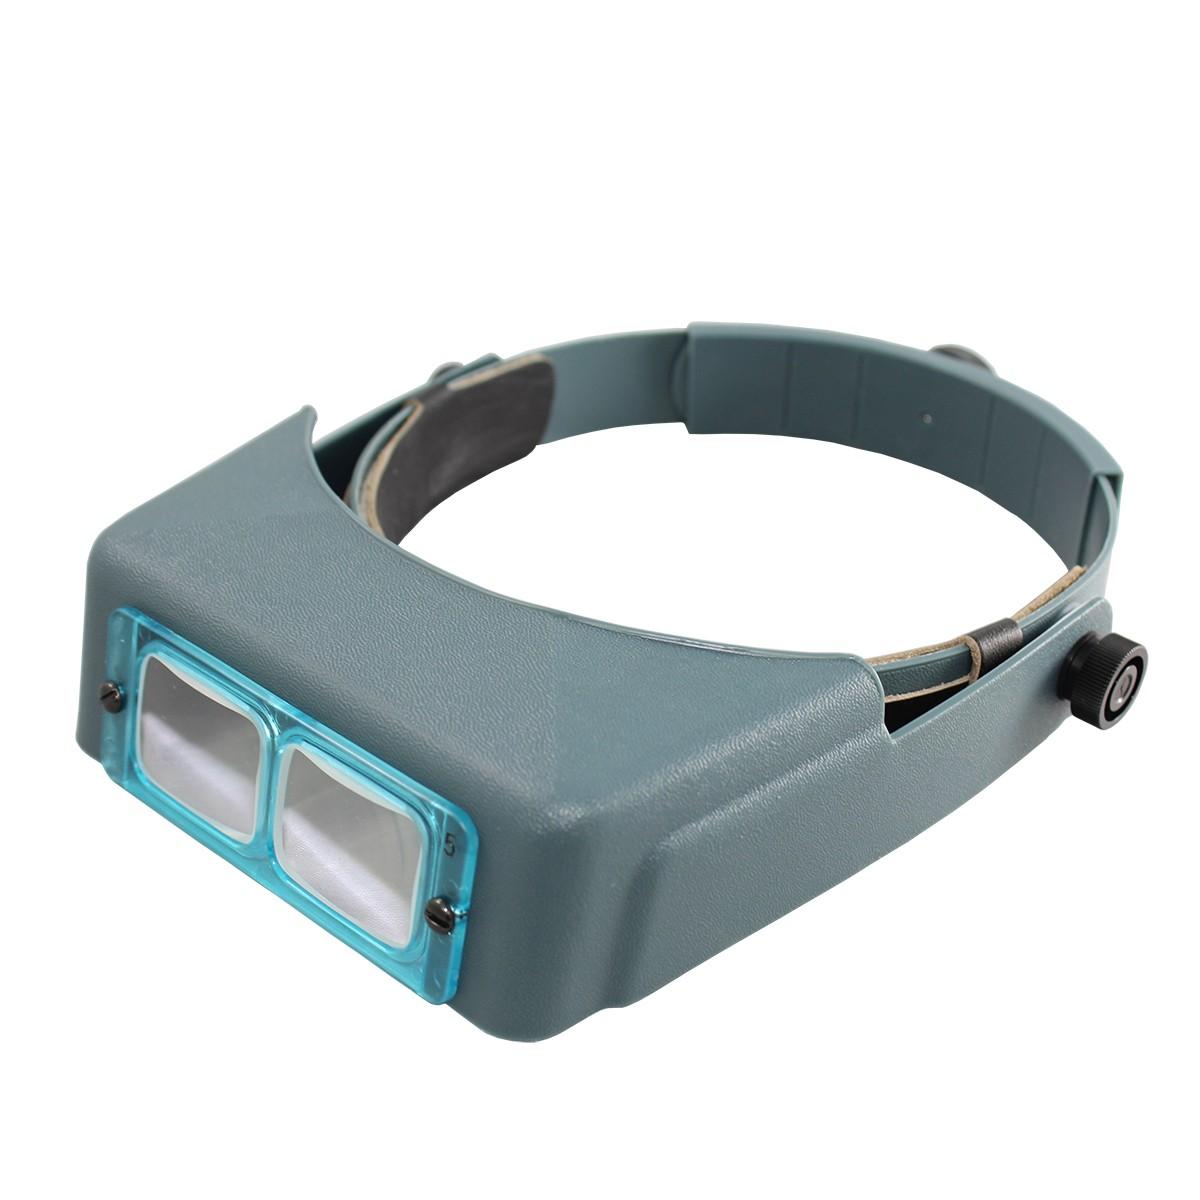 "OptiVISOR Donegan Magnifier 8"" Focal 2.5x DA-5 / LX5"